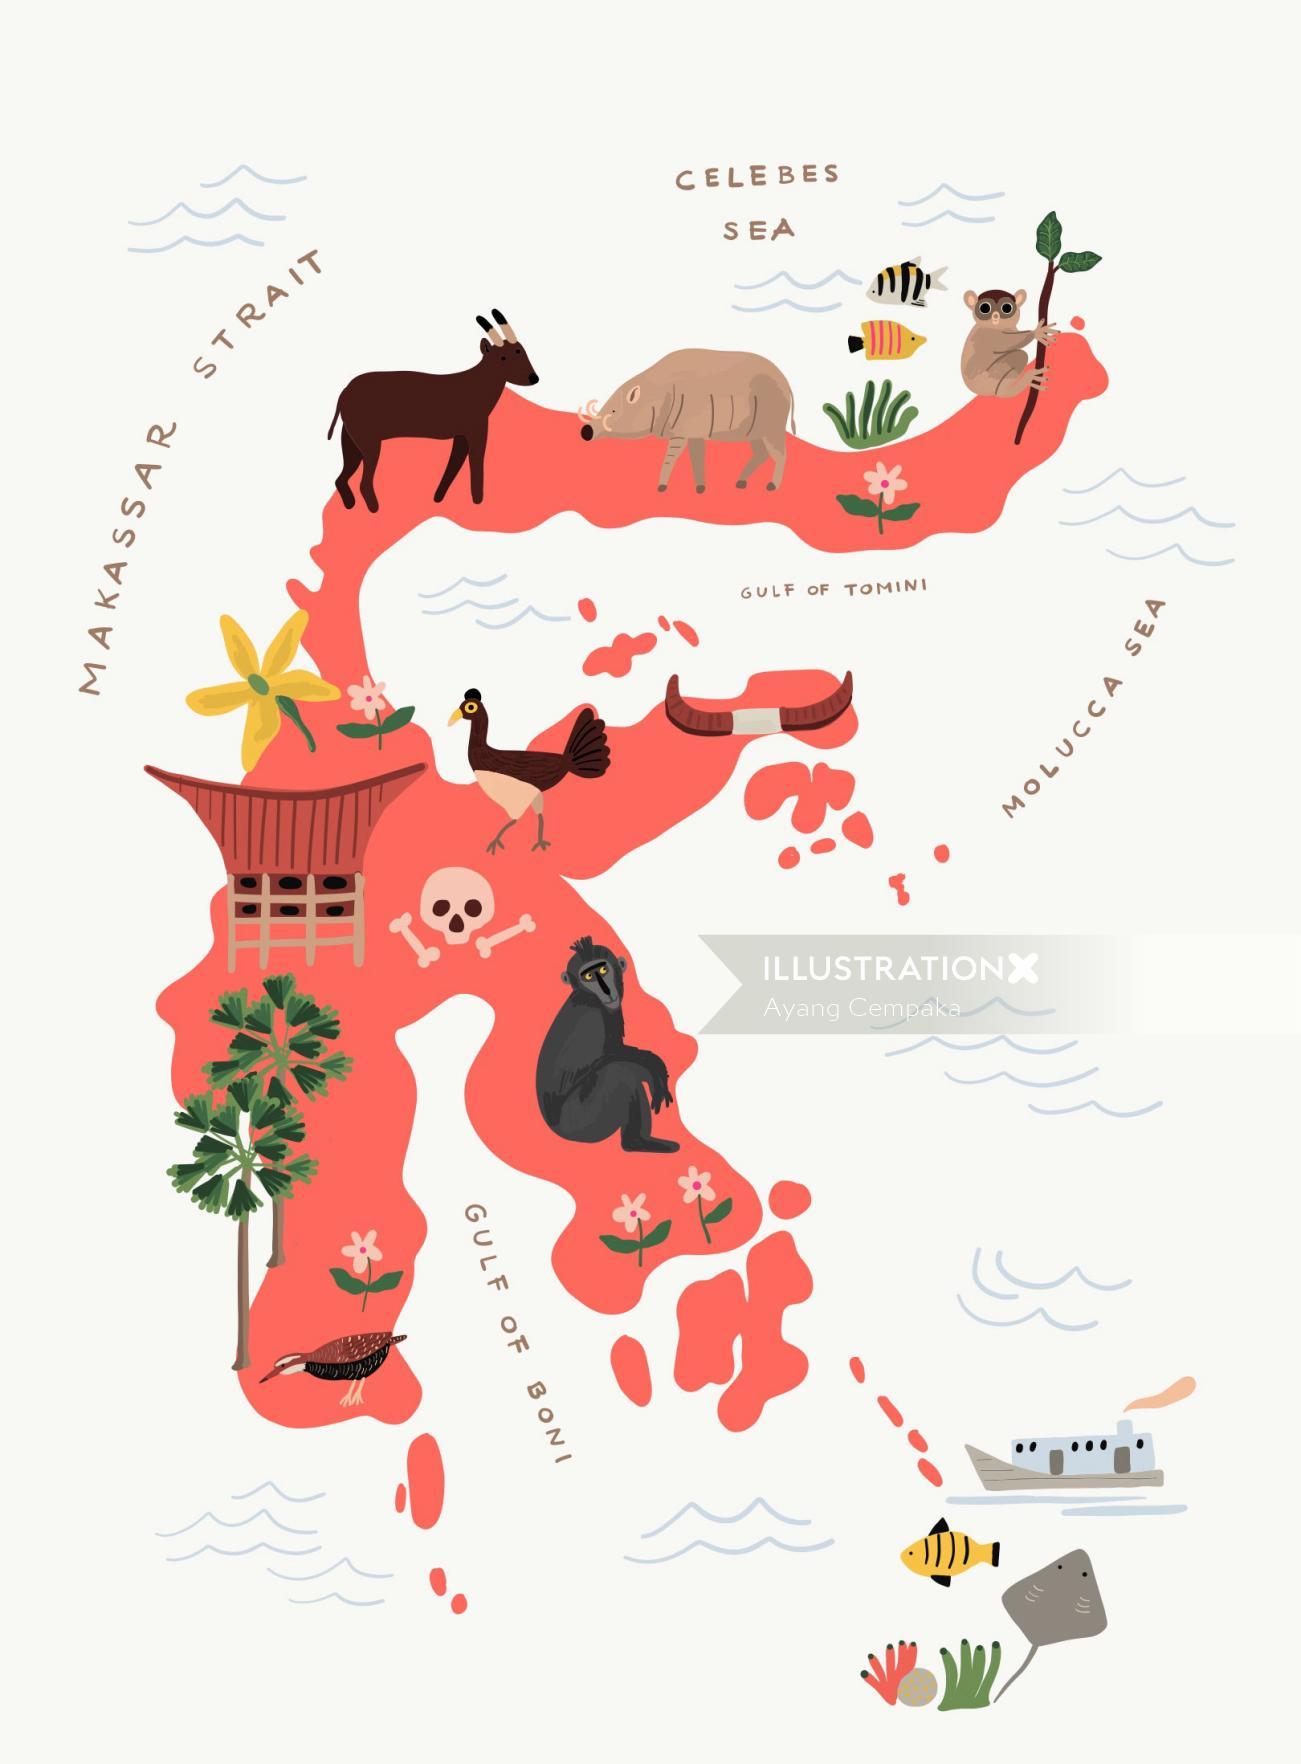 Makassar strait map illustration by Ayang Cempaka